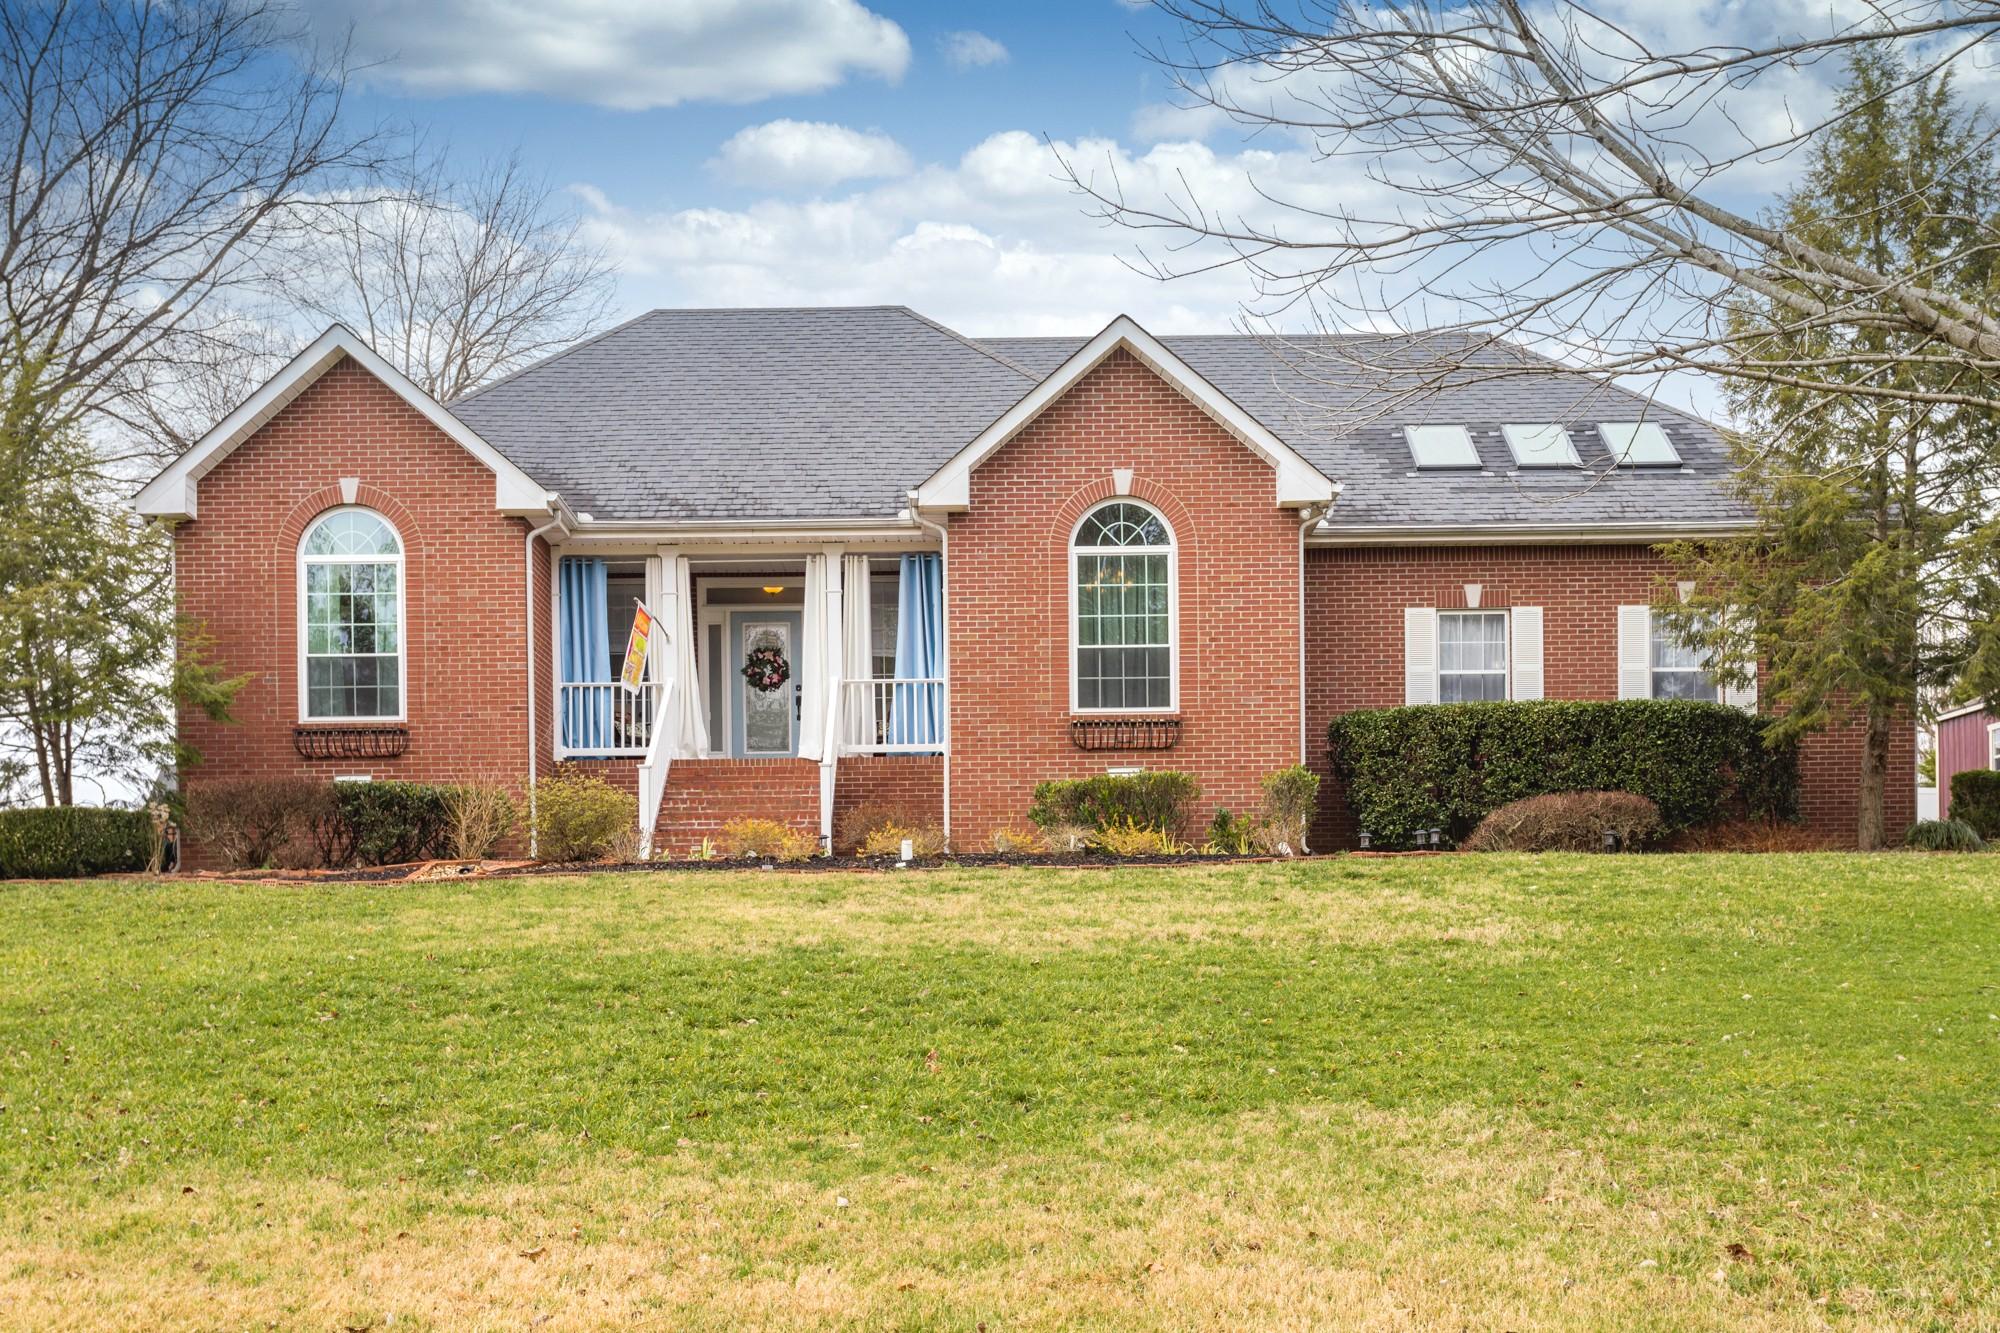 1305 Sycamore Valley Rd, Ashland City, TN 37015 - Ashland City, TN real estate listing